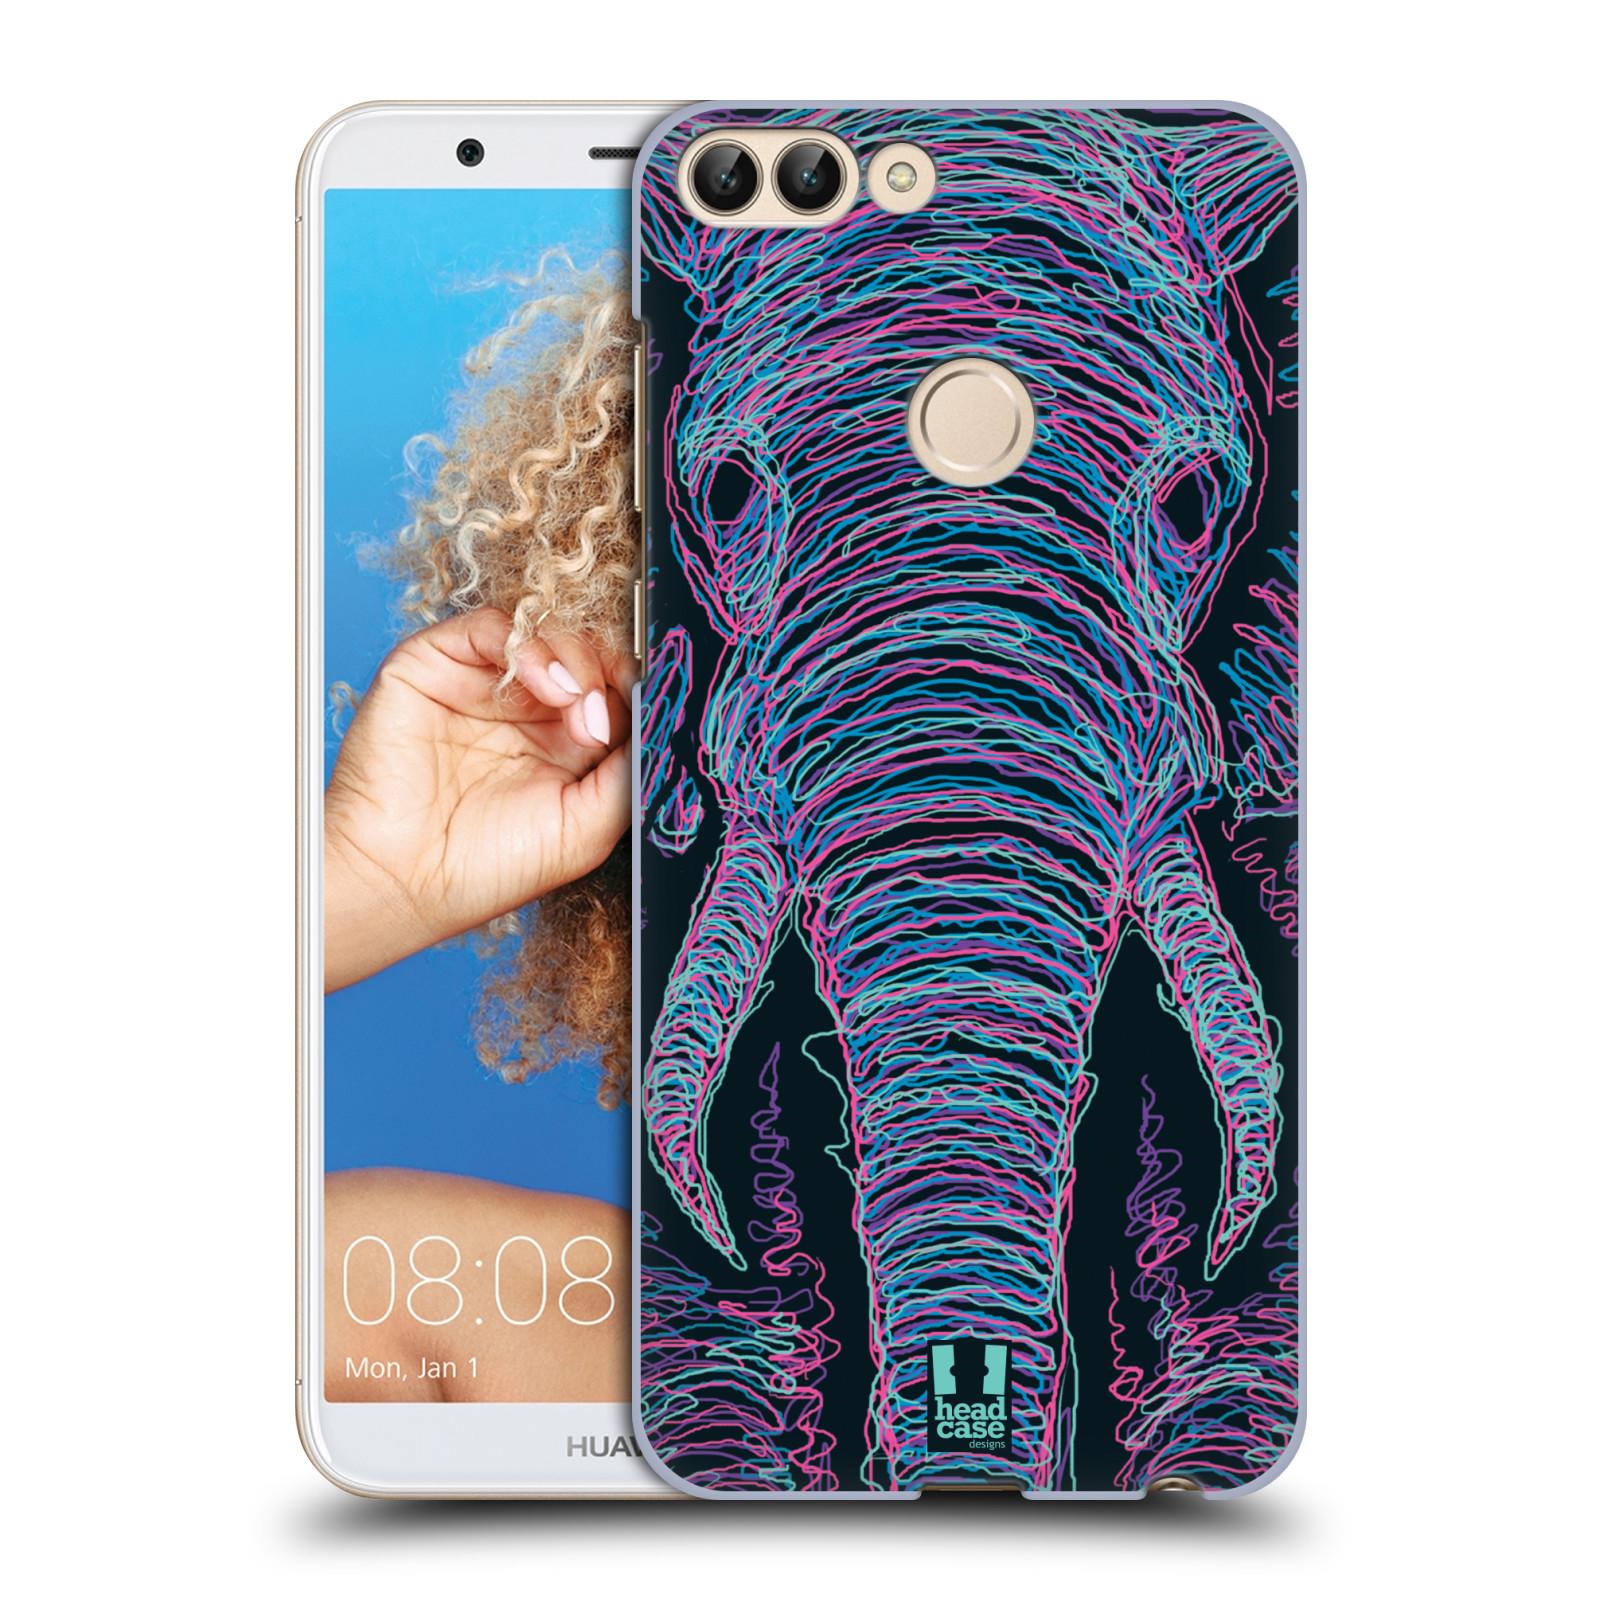 HEAD CASE plastový obal na mobil Huawei P Smart vzor zvíře čmáranice slon